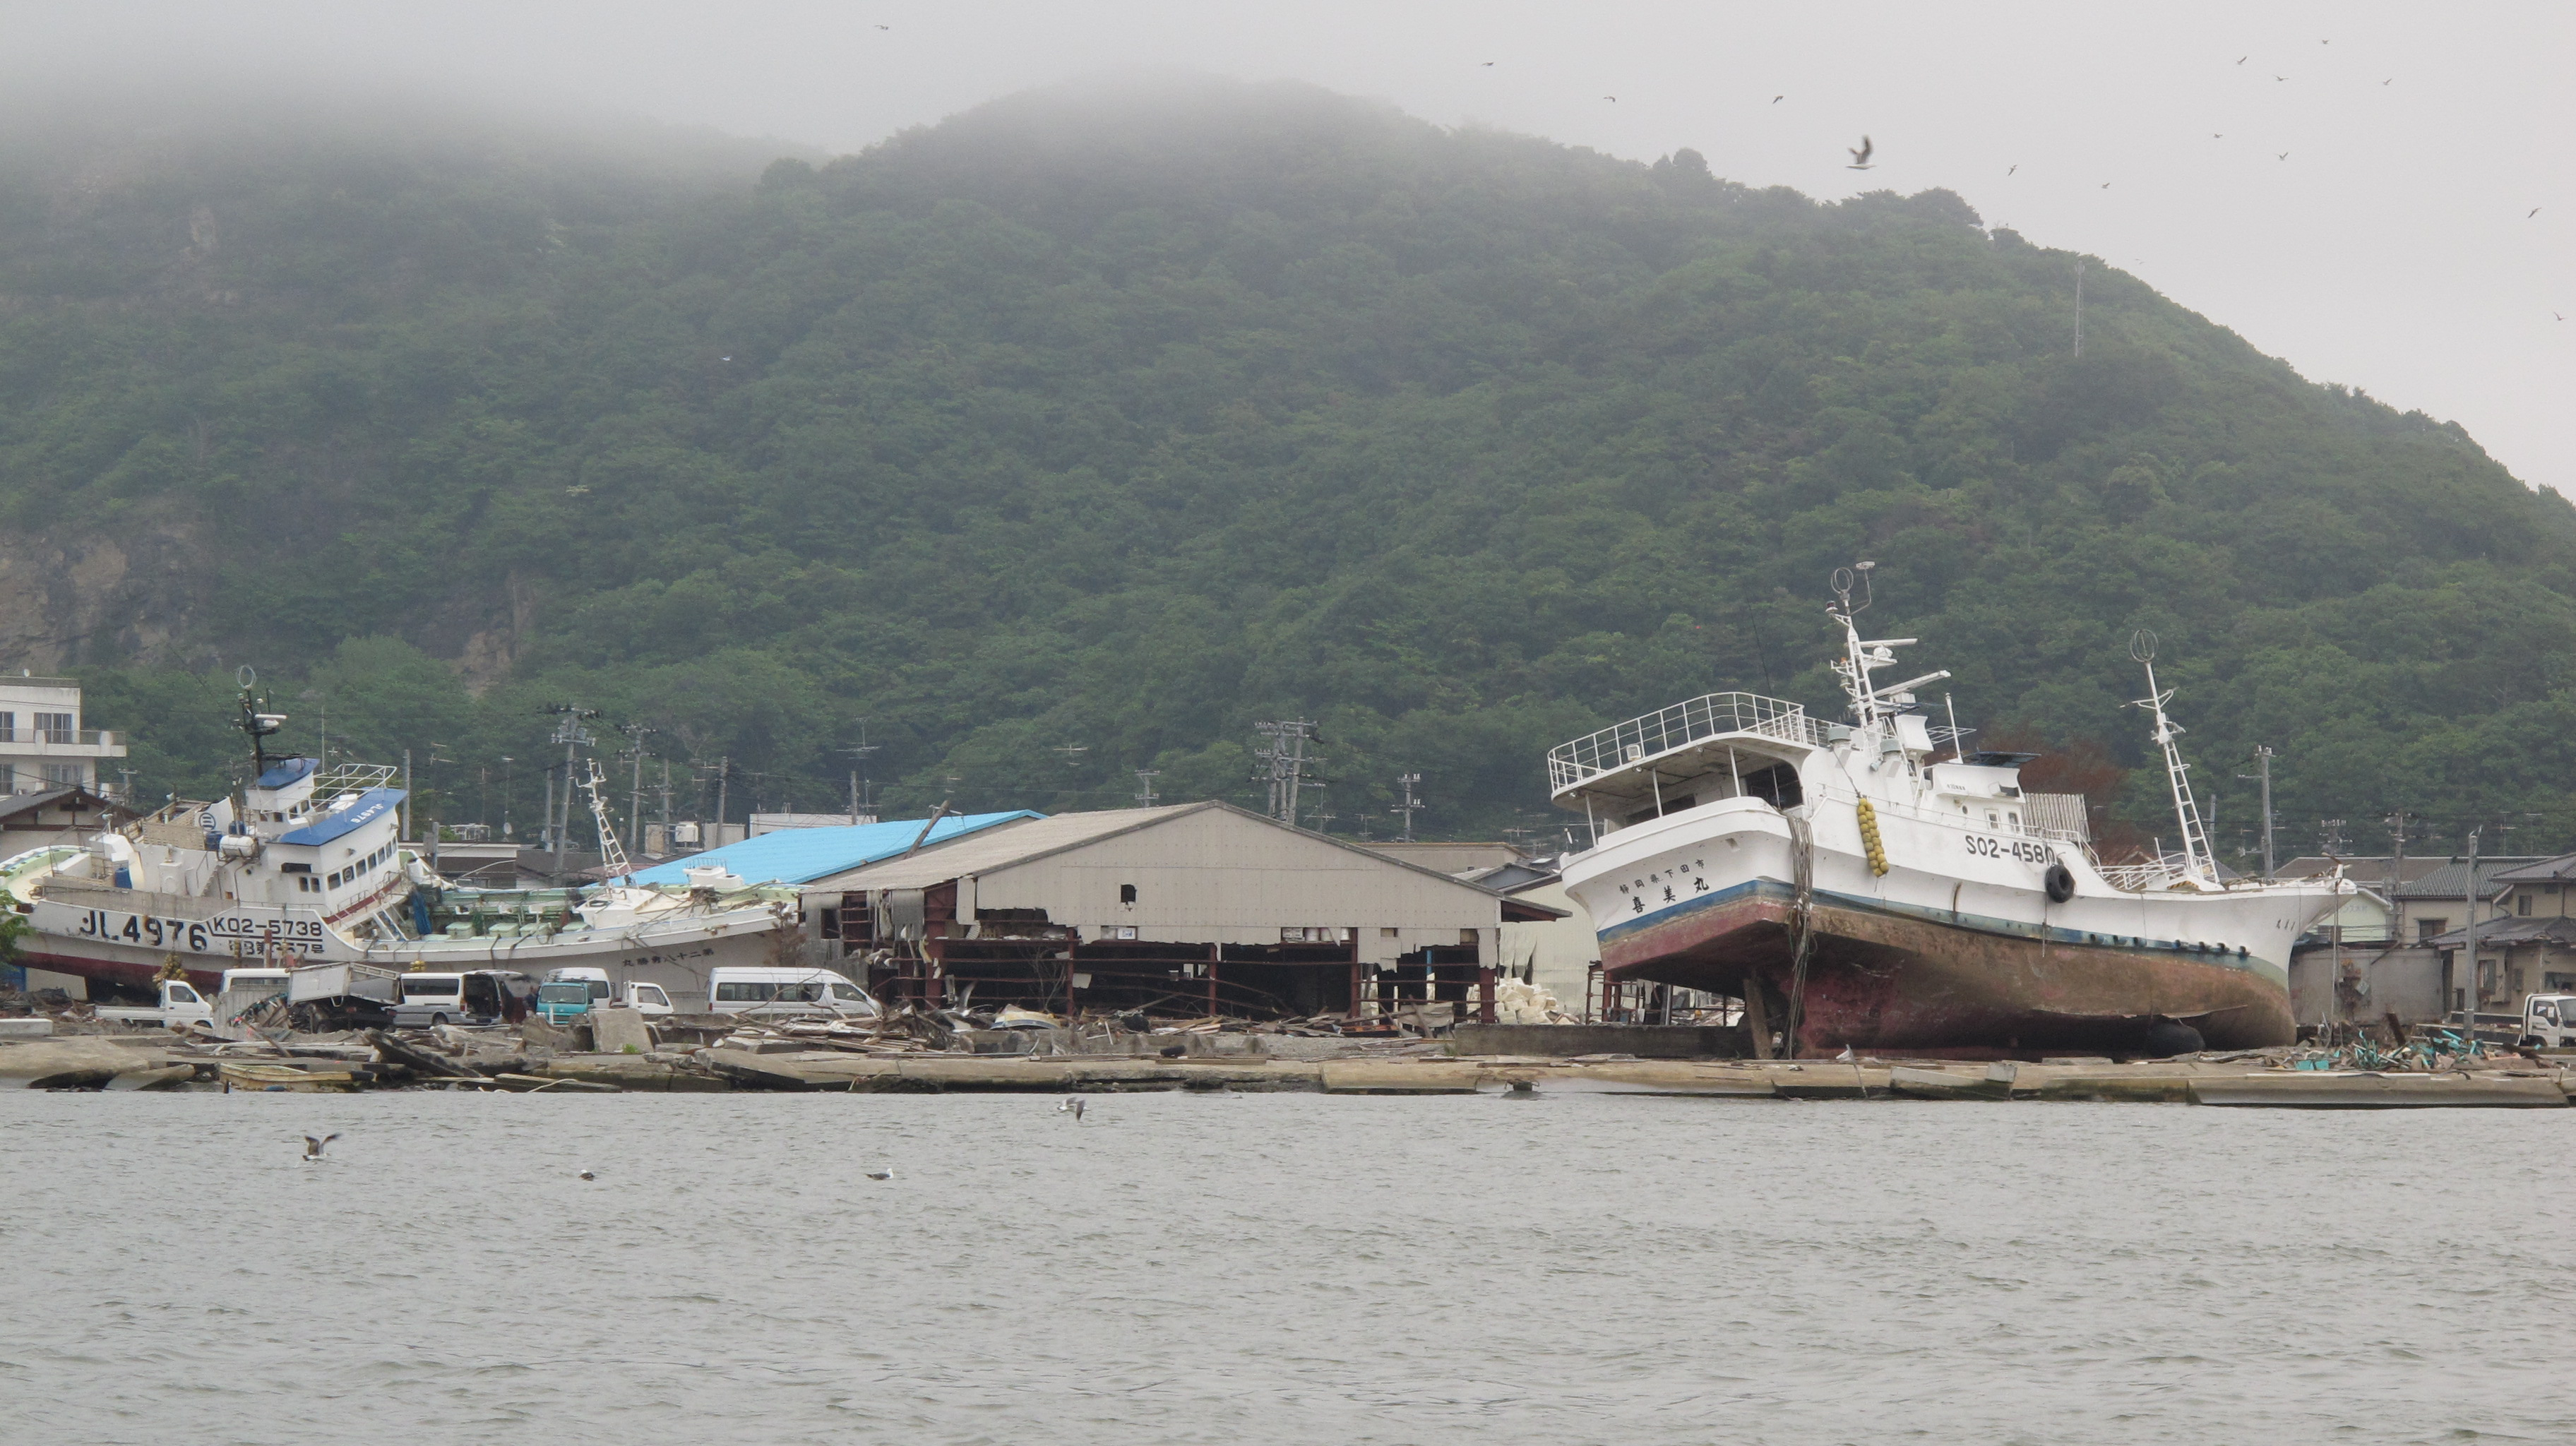 Ishinomaki, Japan following the March 11, 2011 earthquake and tsunami.